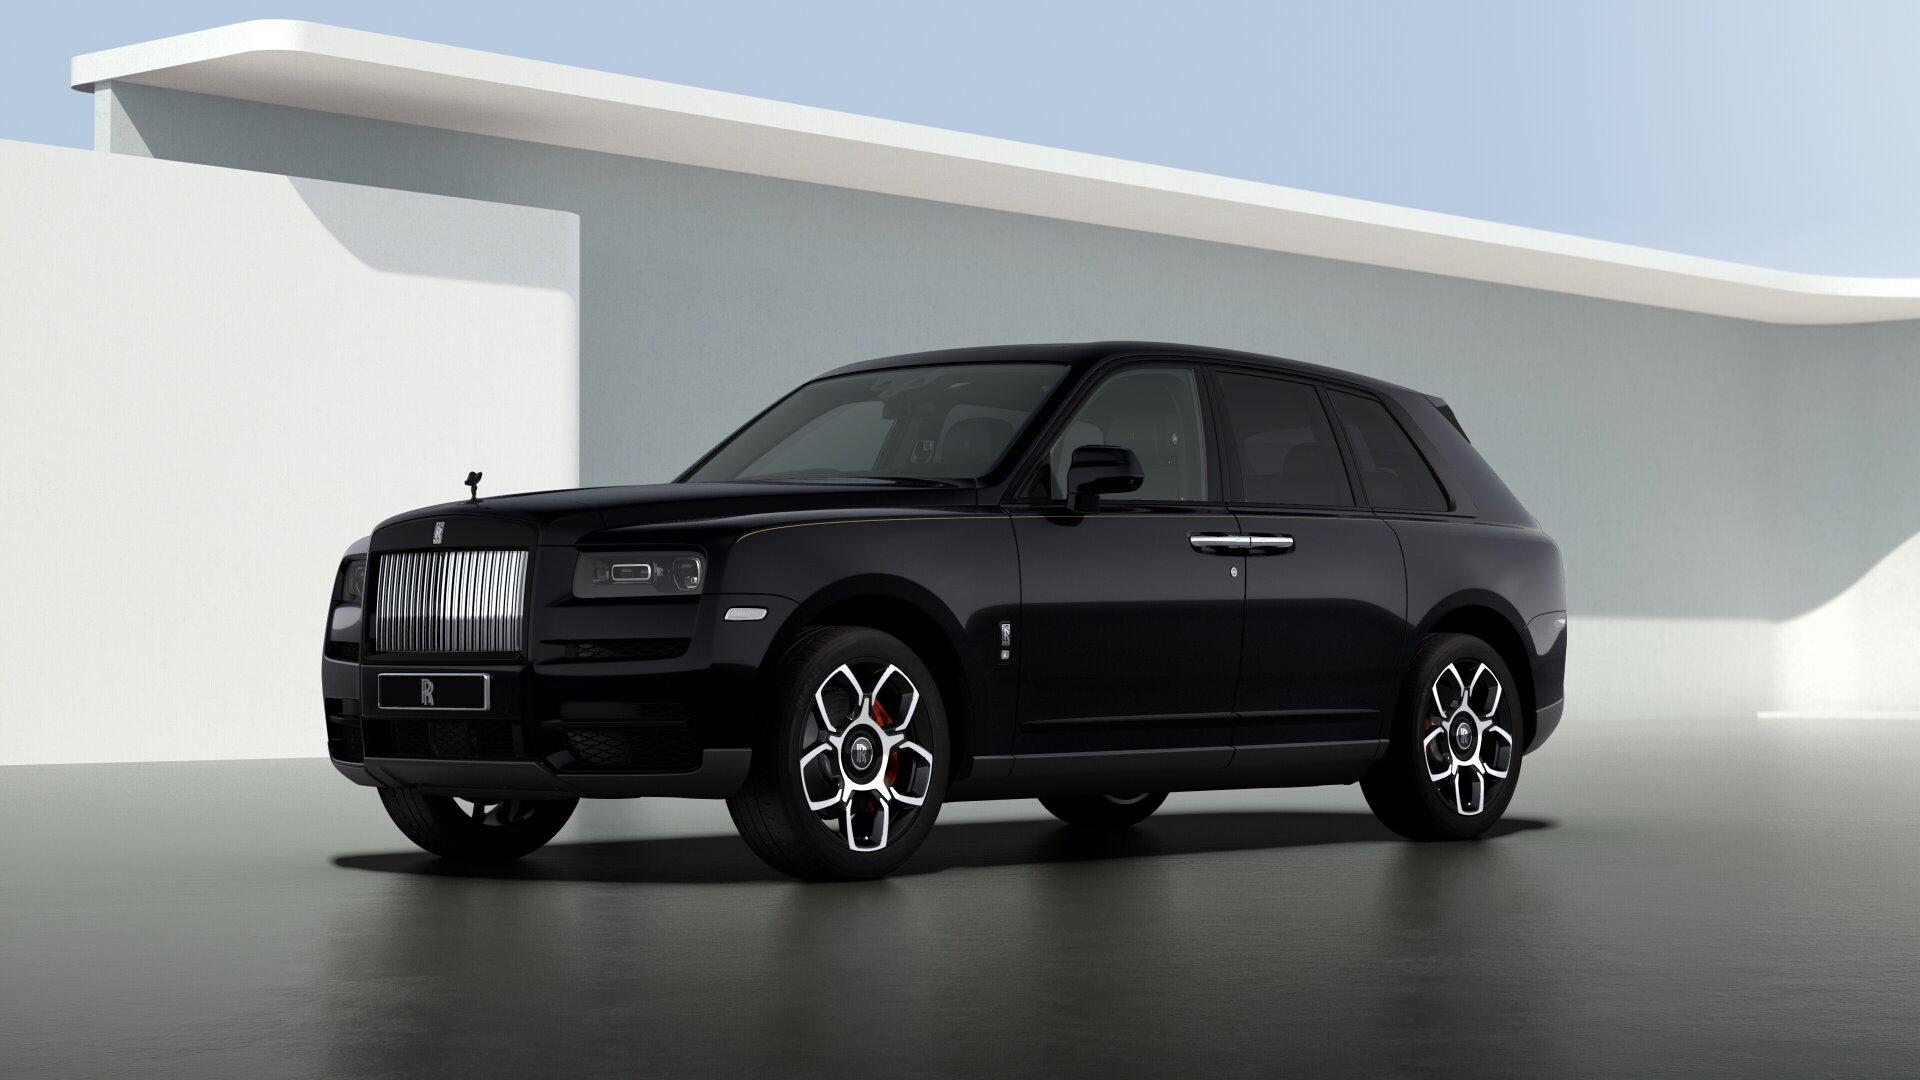 New 2021 Rolls-Royce Cullinan Black Badge for sale $439,700 at Rolls-Royce Motor Cars Greenwich in Greenwich CT 06830 1